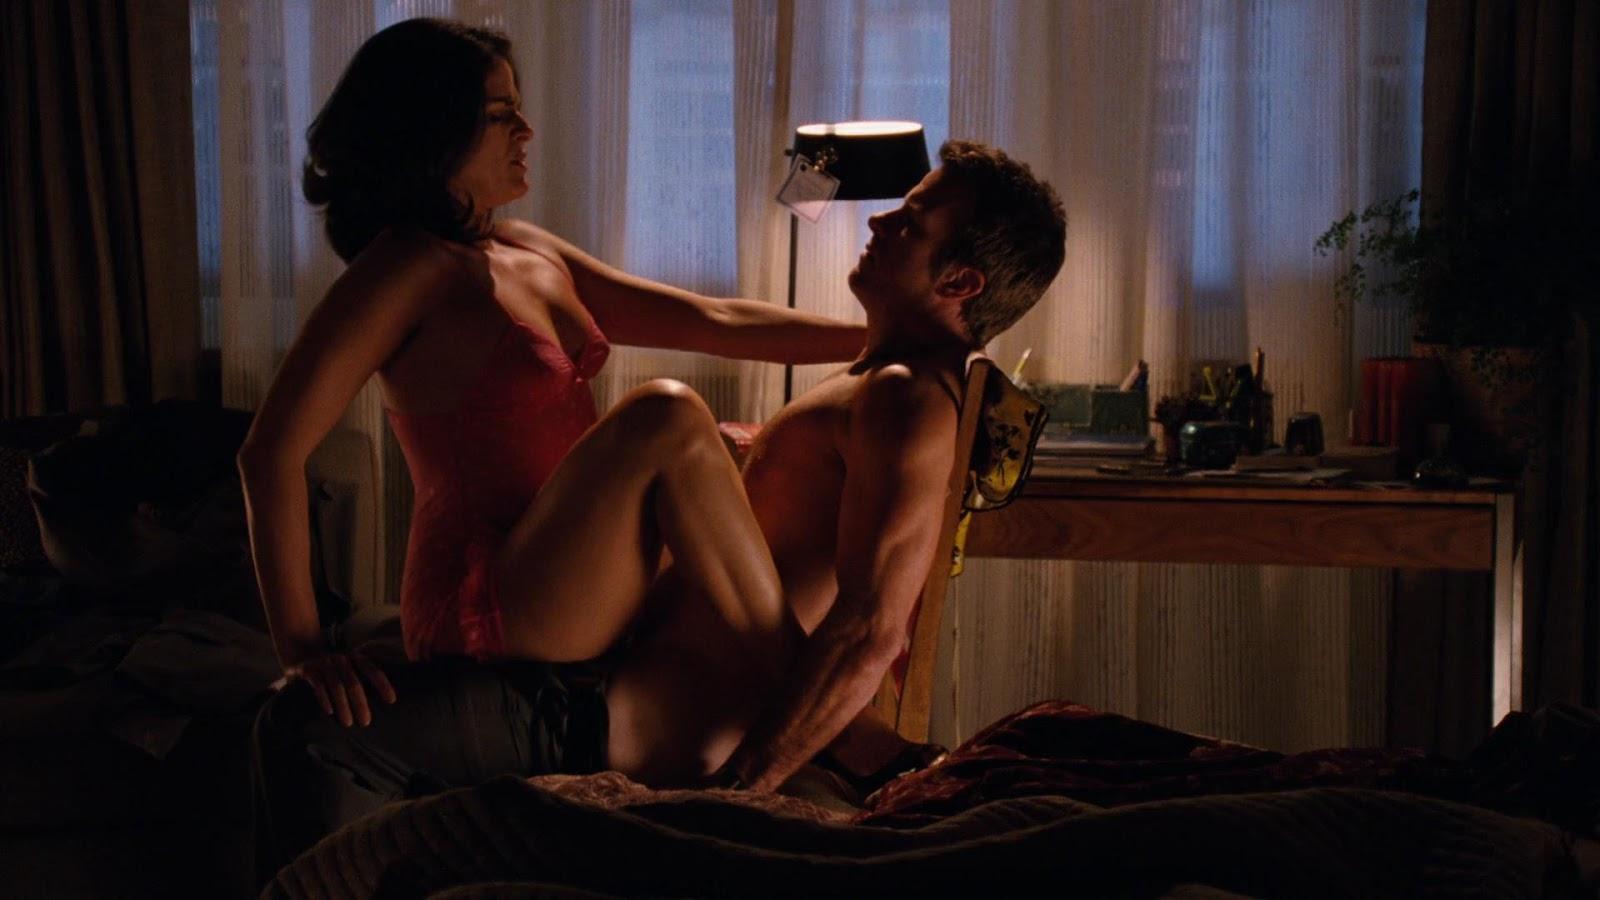 Онлайн Фильмы Про Секс Для Айпад